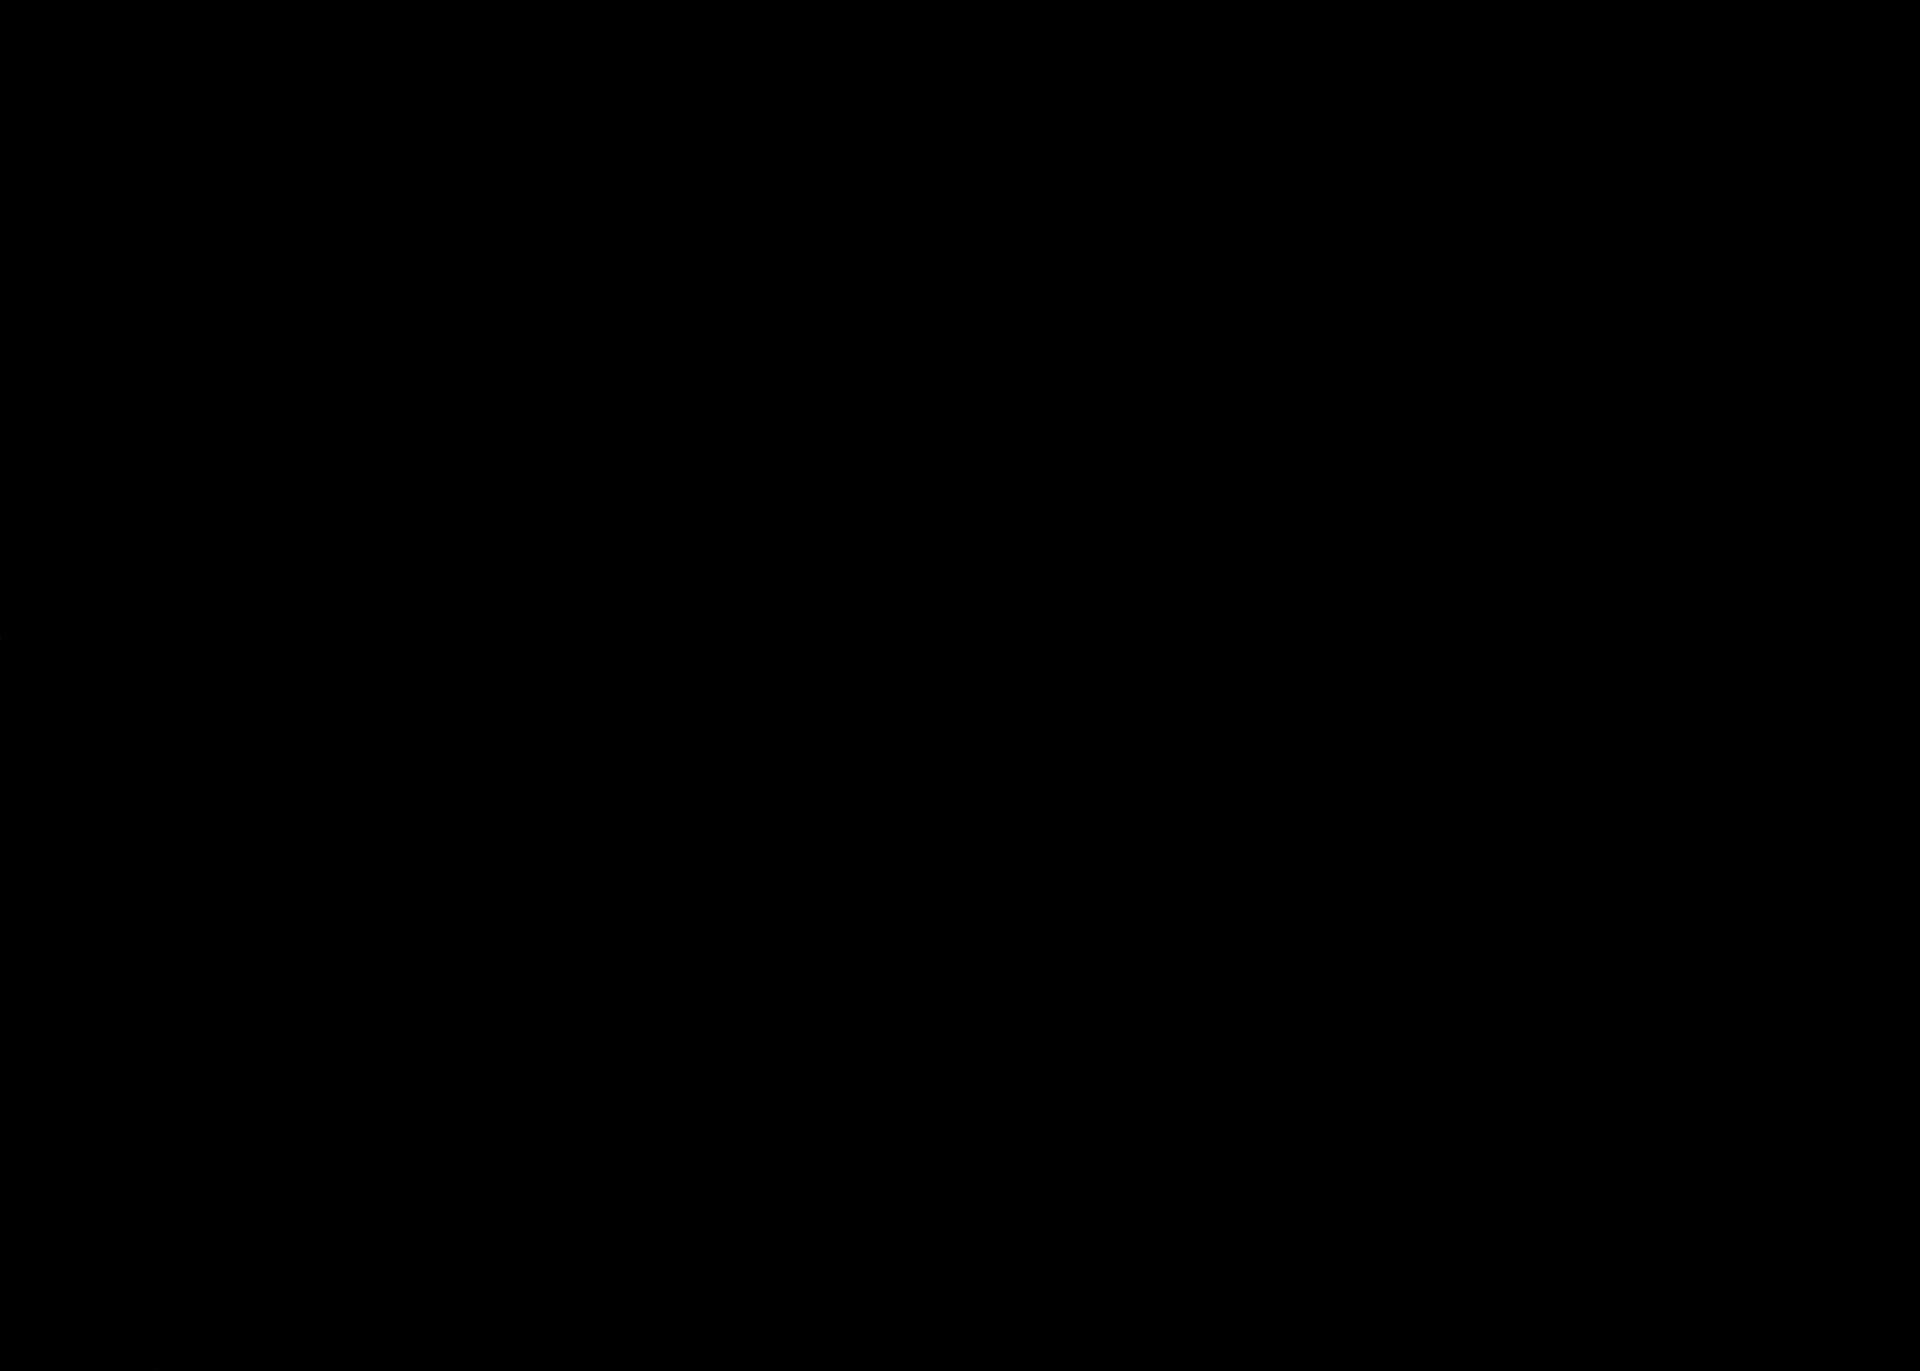 R SOUDAN CONSTRUCTION - Roger Soudanroger@rsoudanconstruction.comSales & Designssales@rsoudanconstruction.comWarrant Requestwarranty@rsoudanconstruction.comJob Opportunitiesjobs@rsoudanconstruction.com